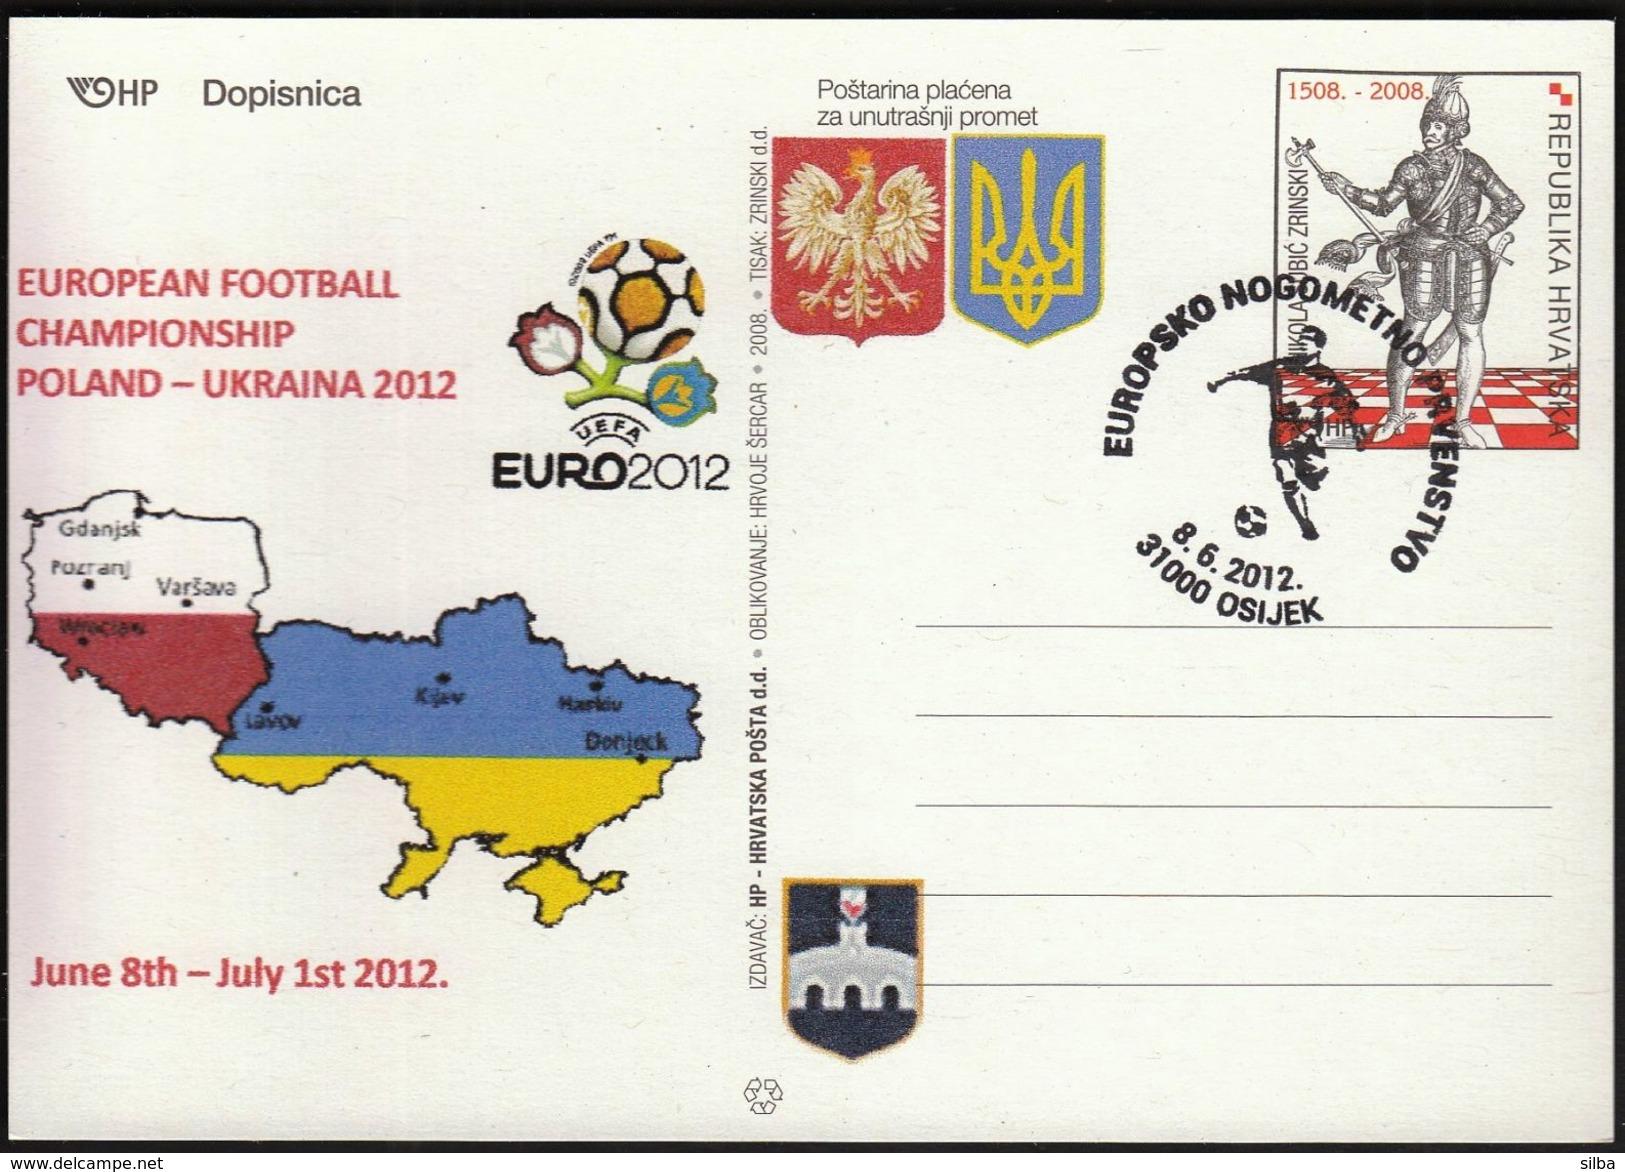 Croatia Osijek 2012 / Soccer Football / European Championship EURO 2012 Poland - Ukraine - Eurocopa (UEFA)